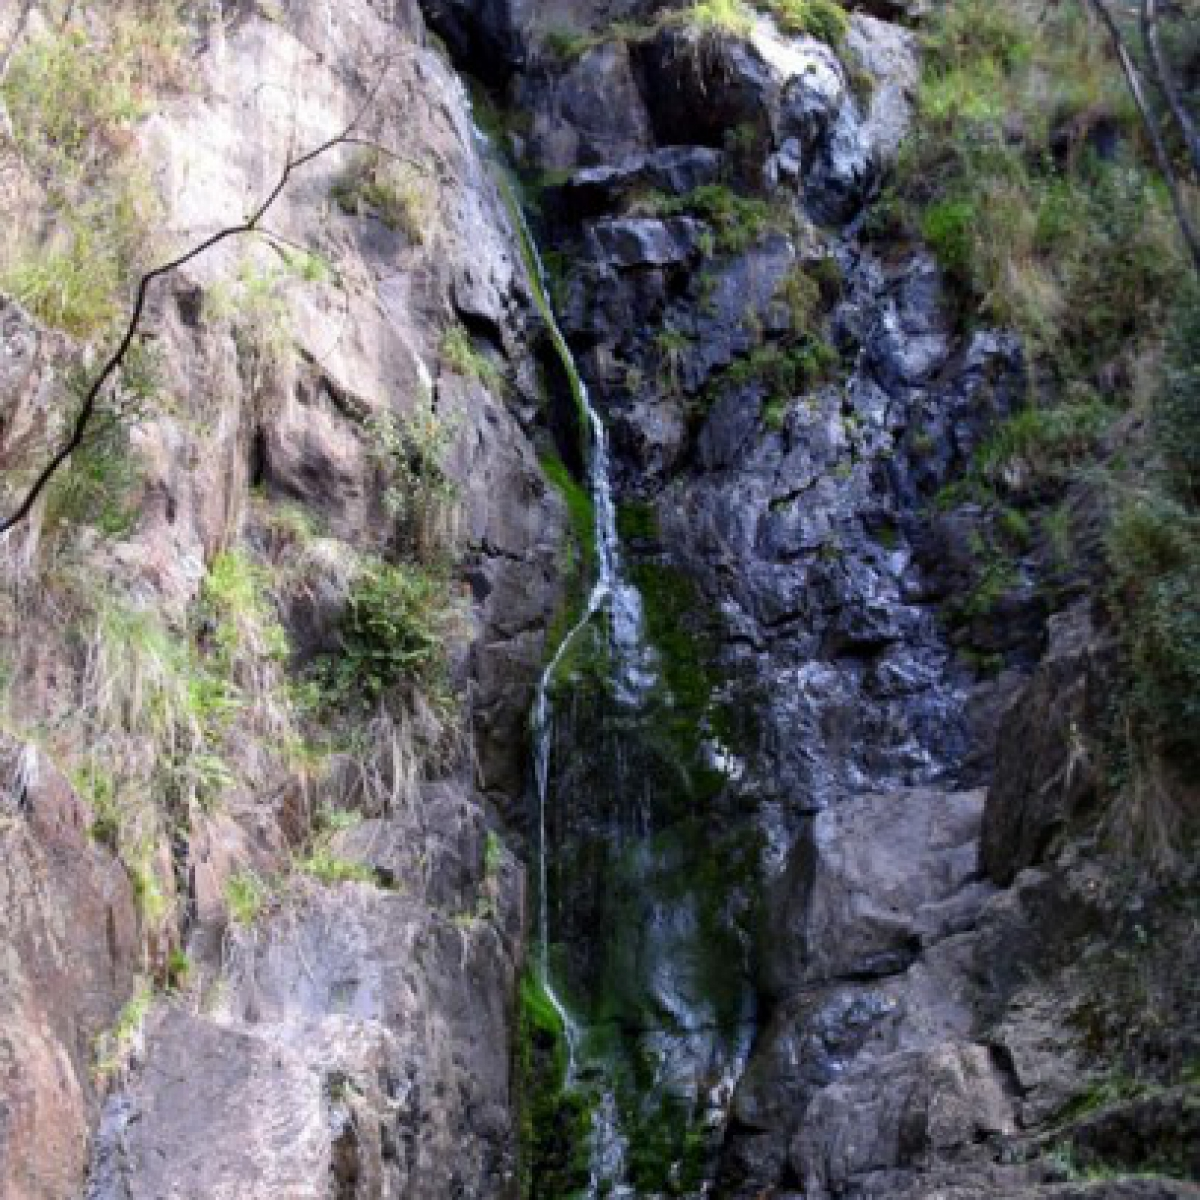 Coree Falls - Brindabella National Park